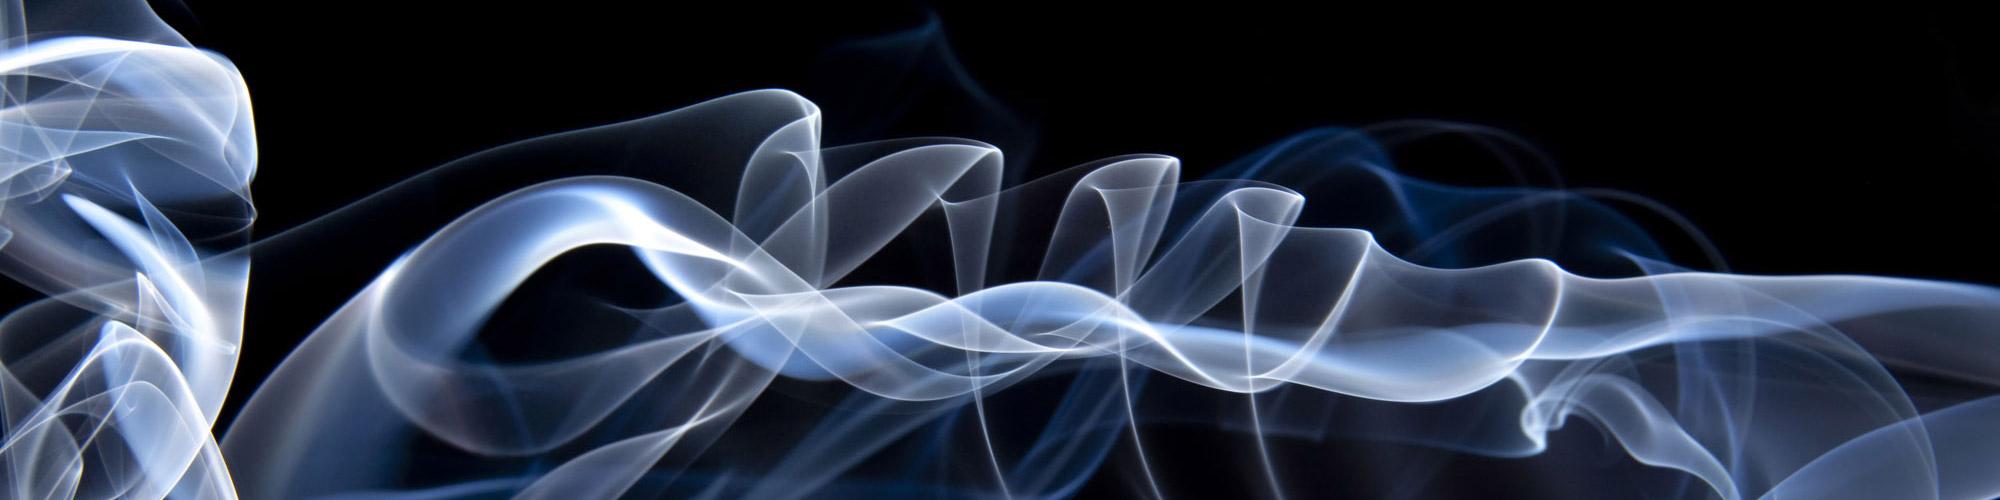 Bandeau de turbulences